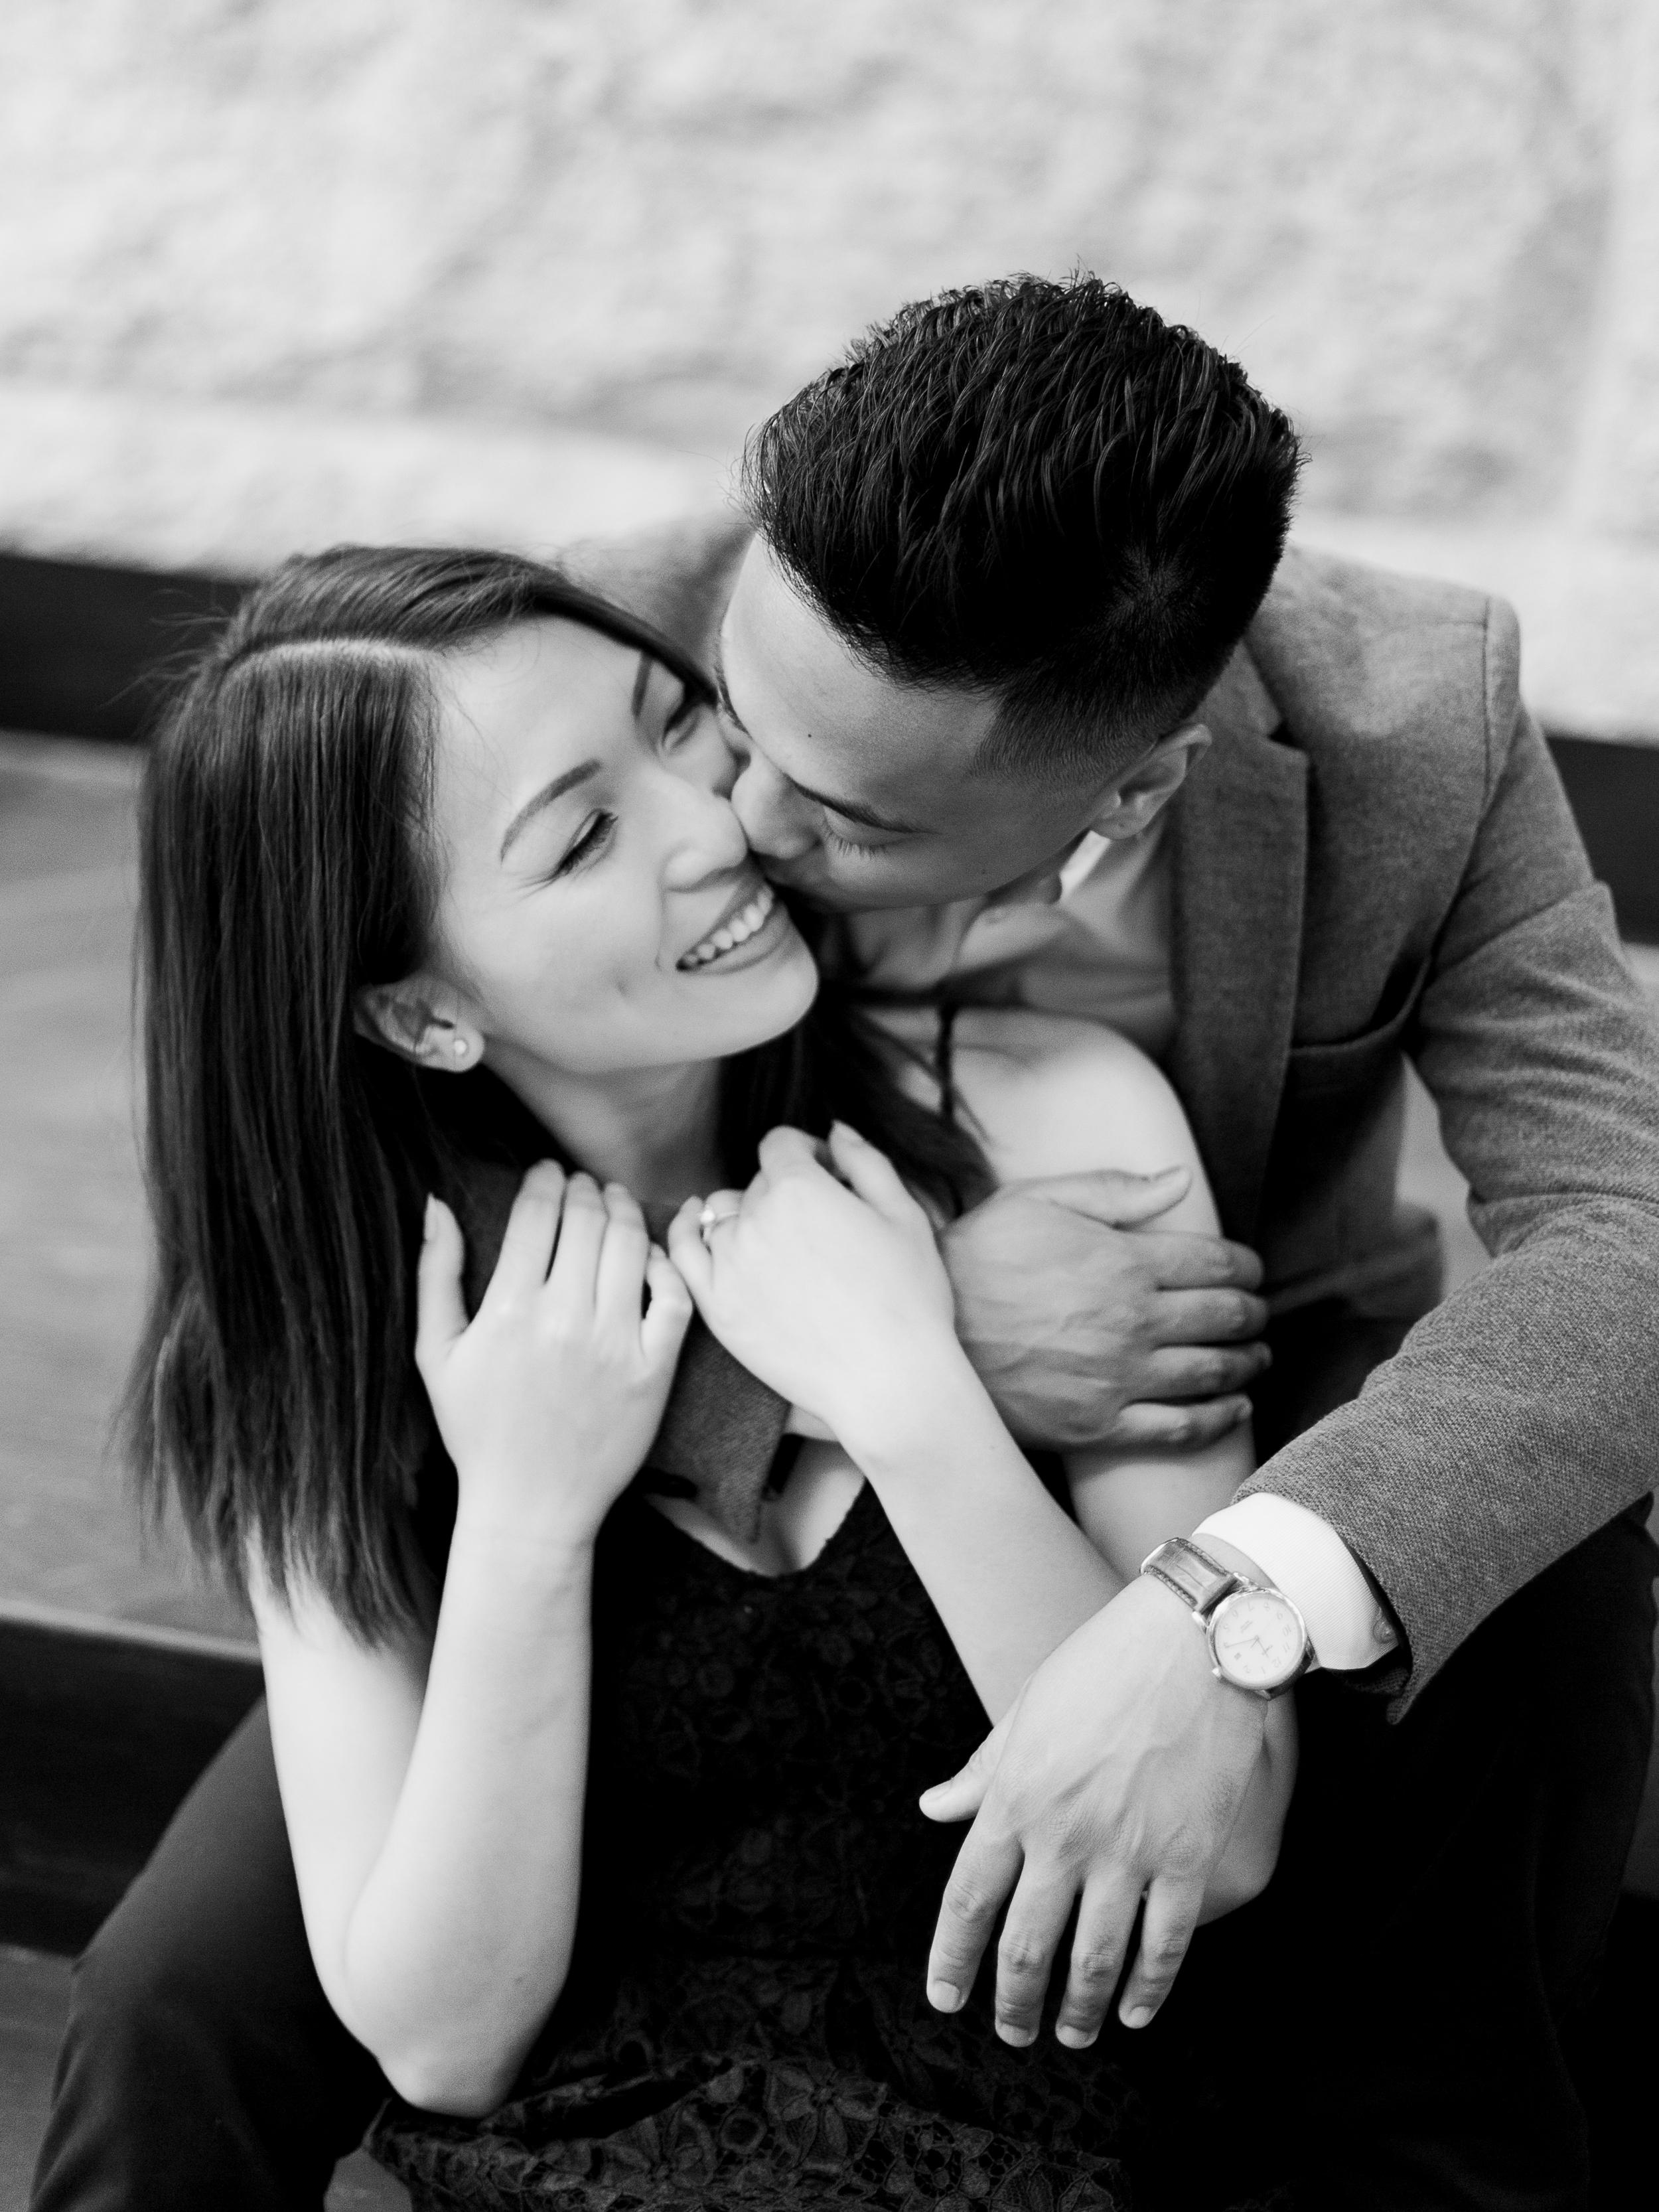 Romantic-Black-And-White-Engagement-Photoshoot-Winnipeg-Manitoba-Keila-Marie-Photography